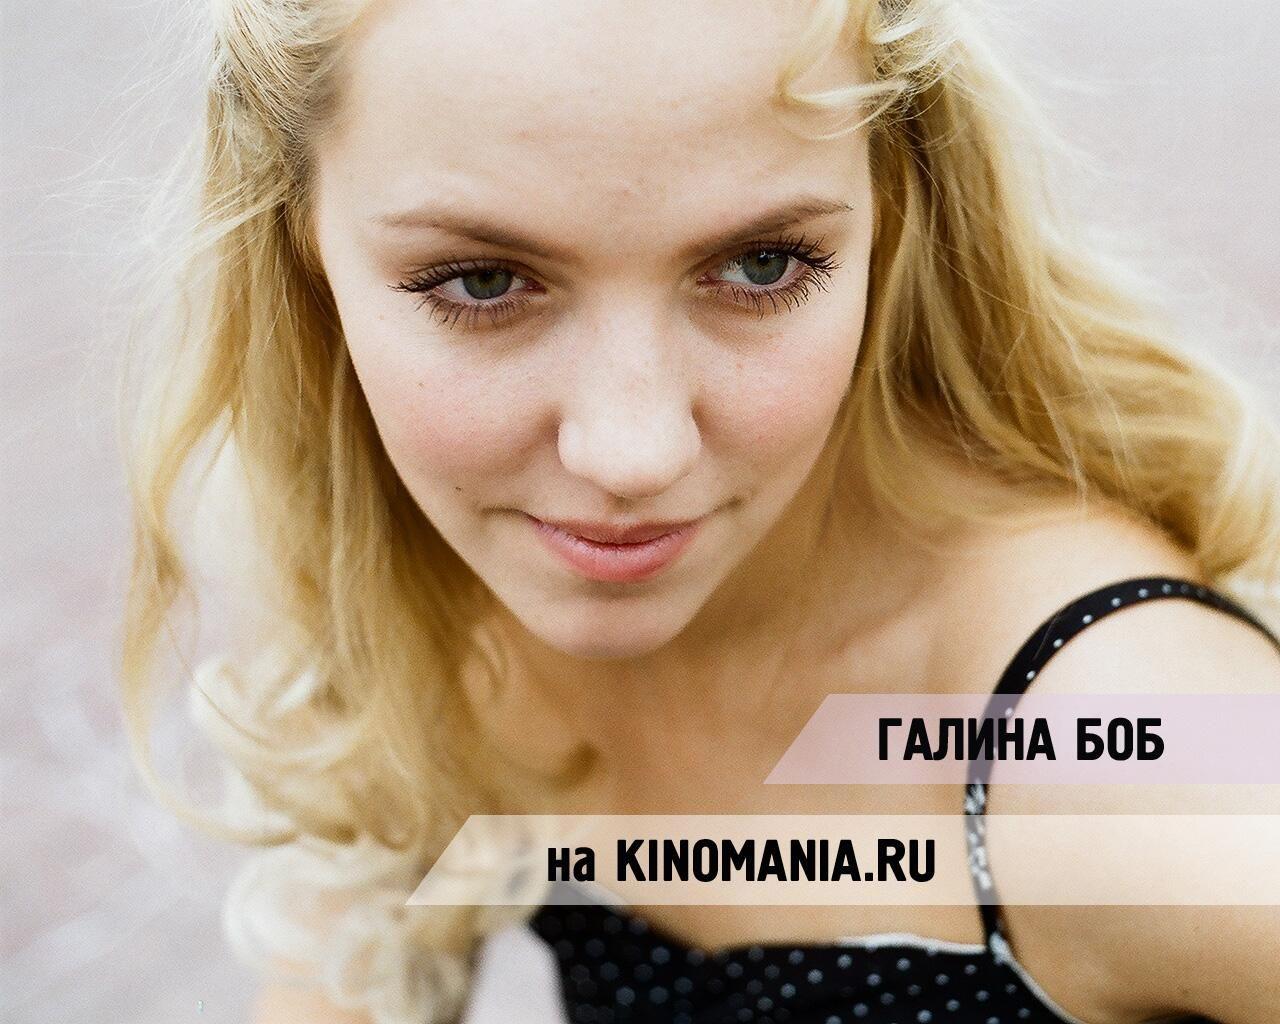 Галина боб без макияжа